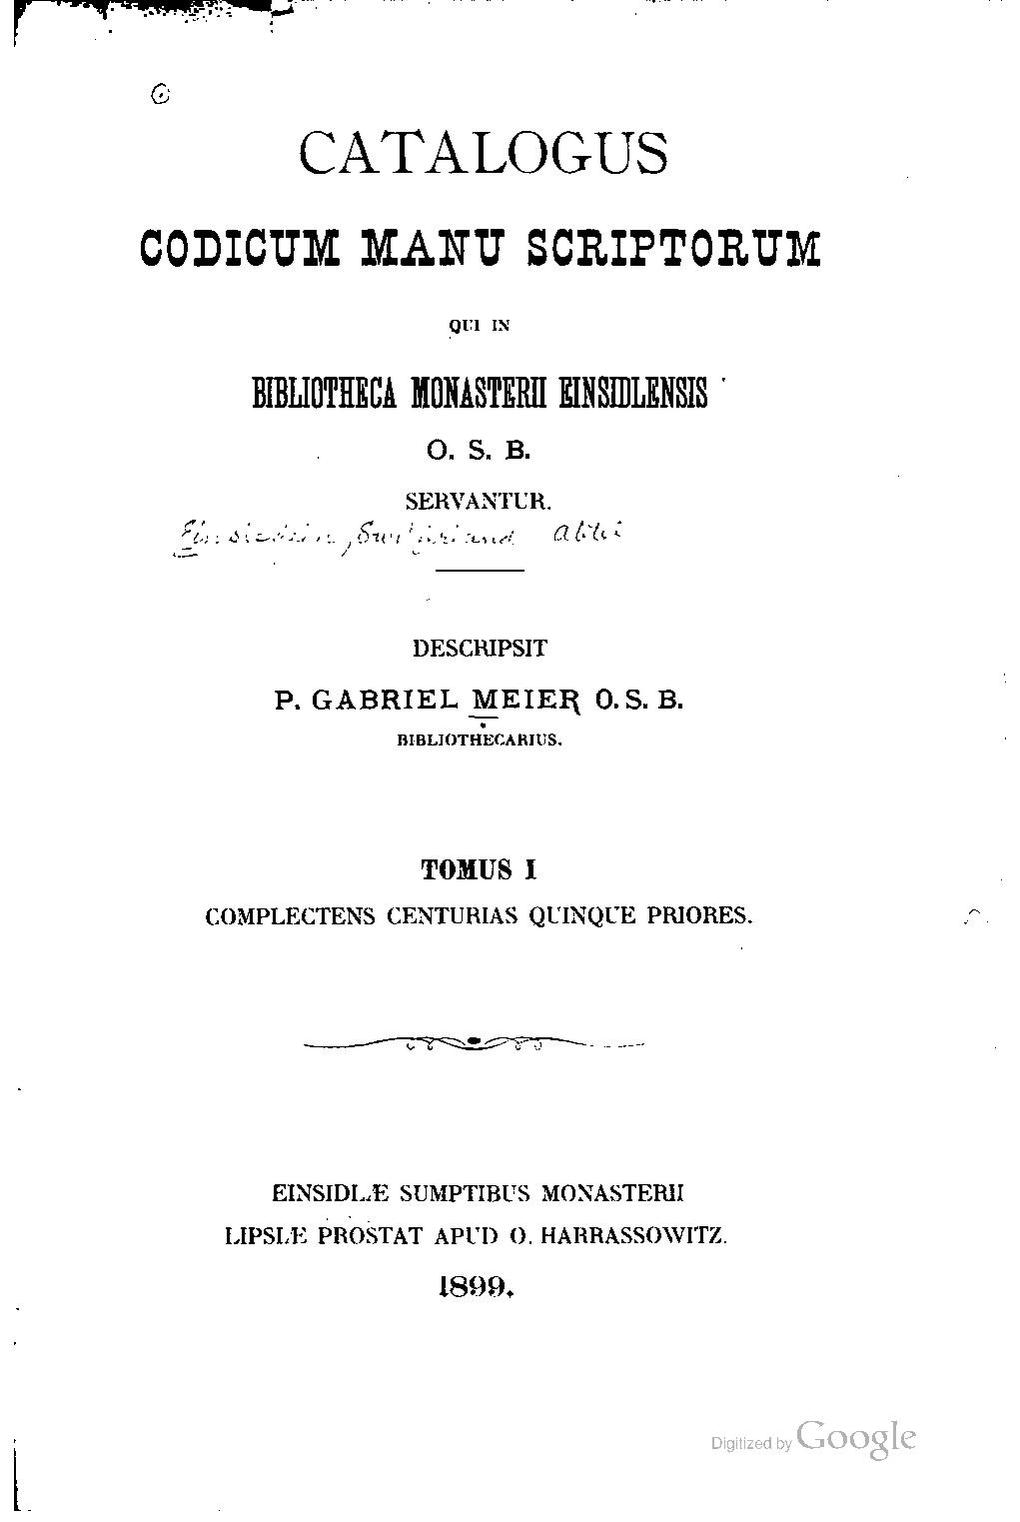 Catalogus codicum manu scriptorum qui in bibliotheca monasterii Einsidlensis.pdf